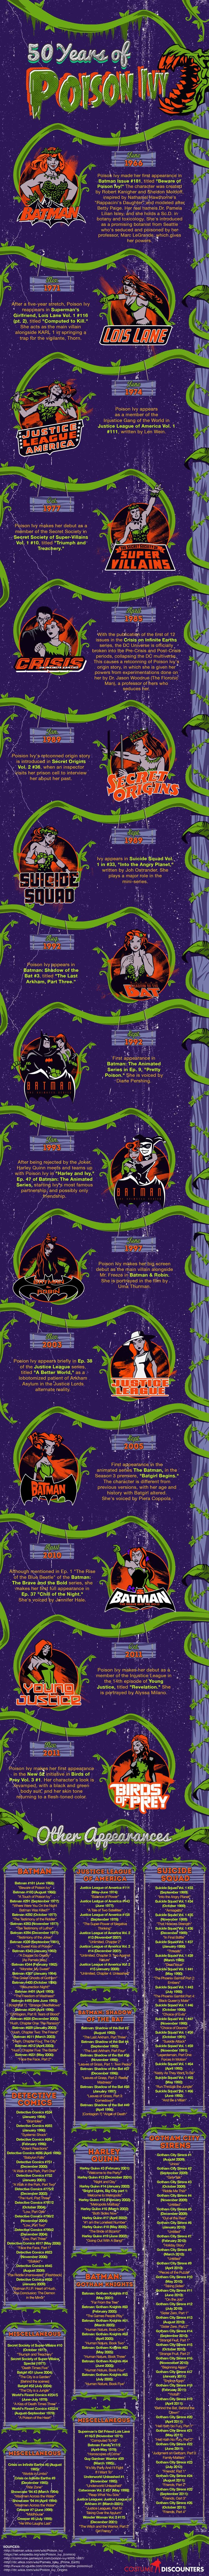 best infografias infographics images on pinterest